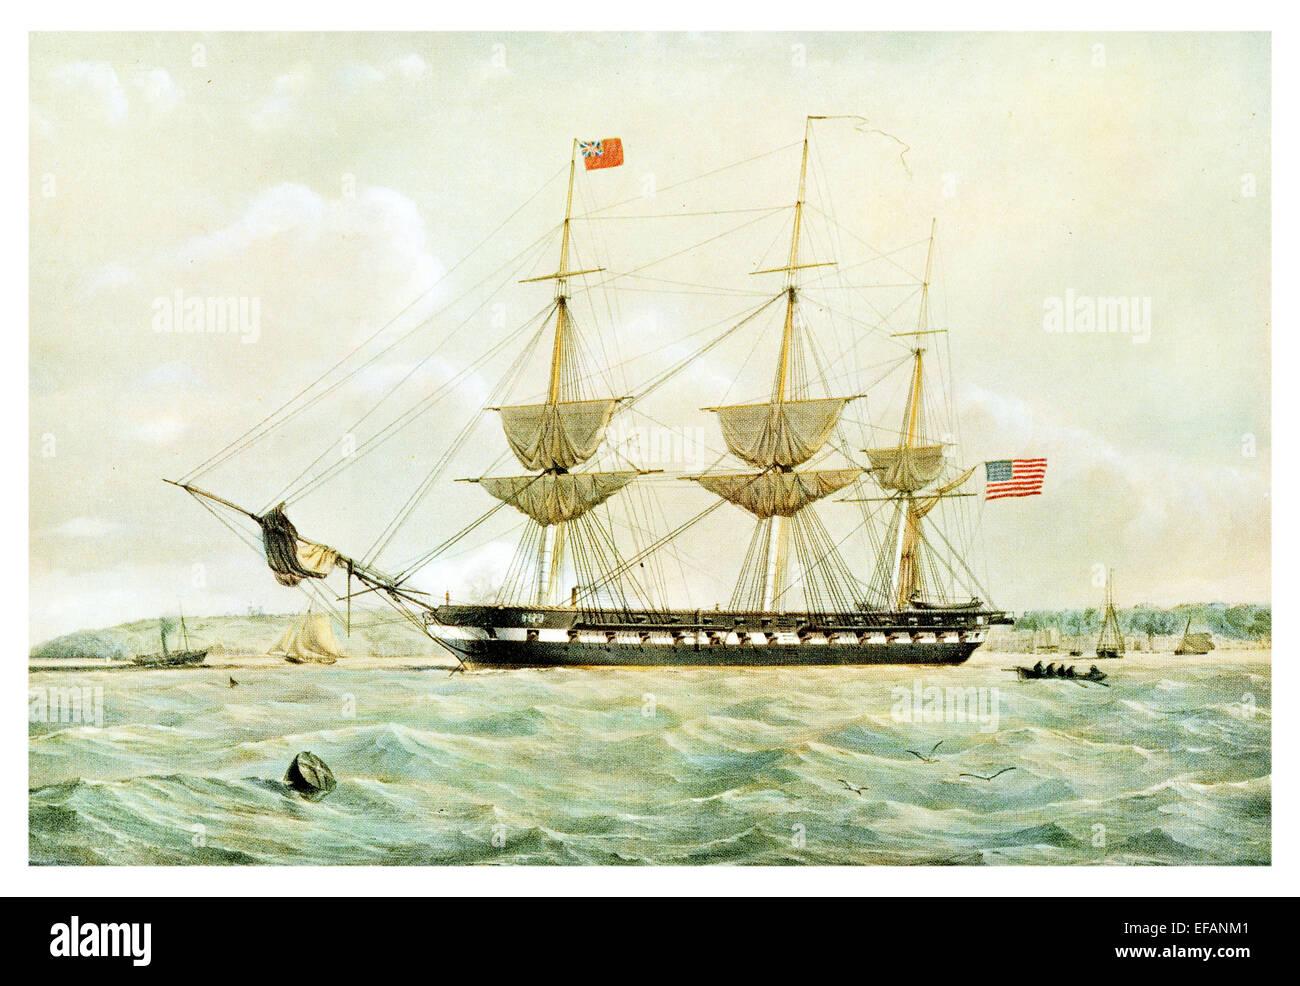 U.S.S. St Lawrence 50 gun 1847 Built Norfolk Navy Yard. Paraguay Expedition 1858.After war Became Marine Barracks - Stock Image